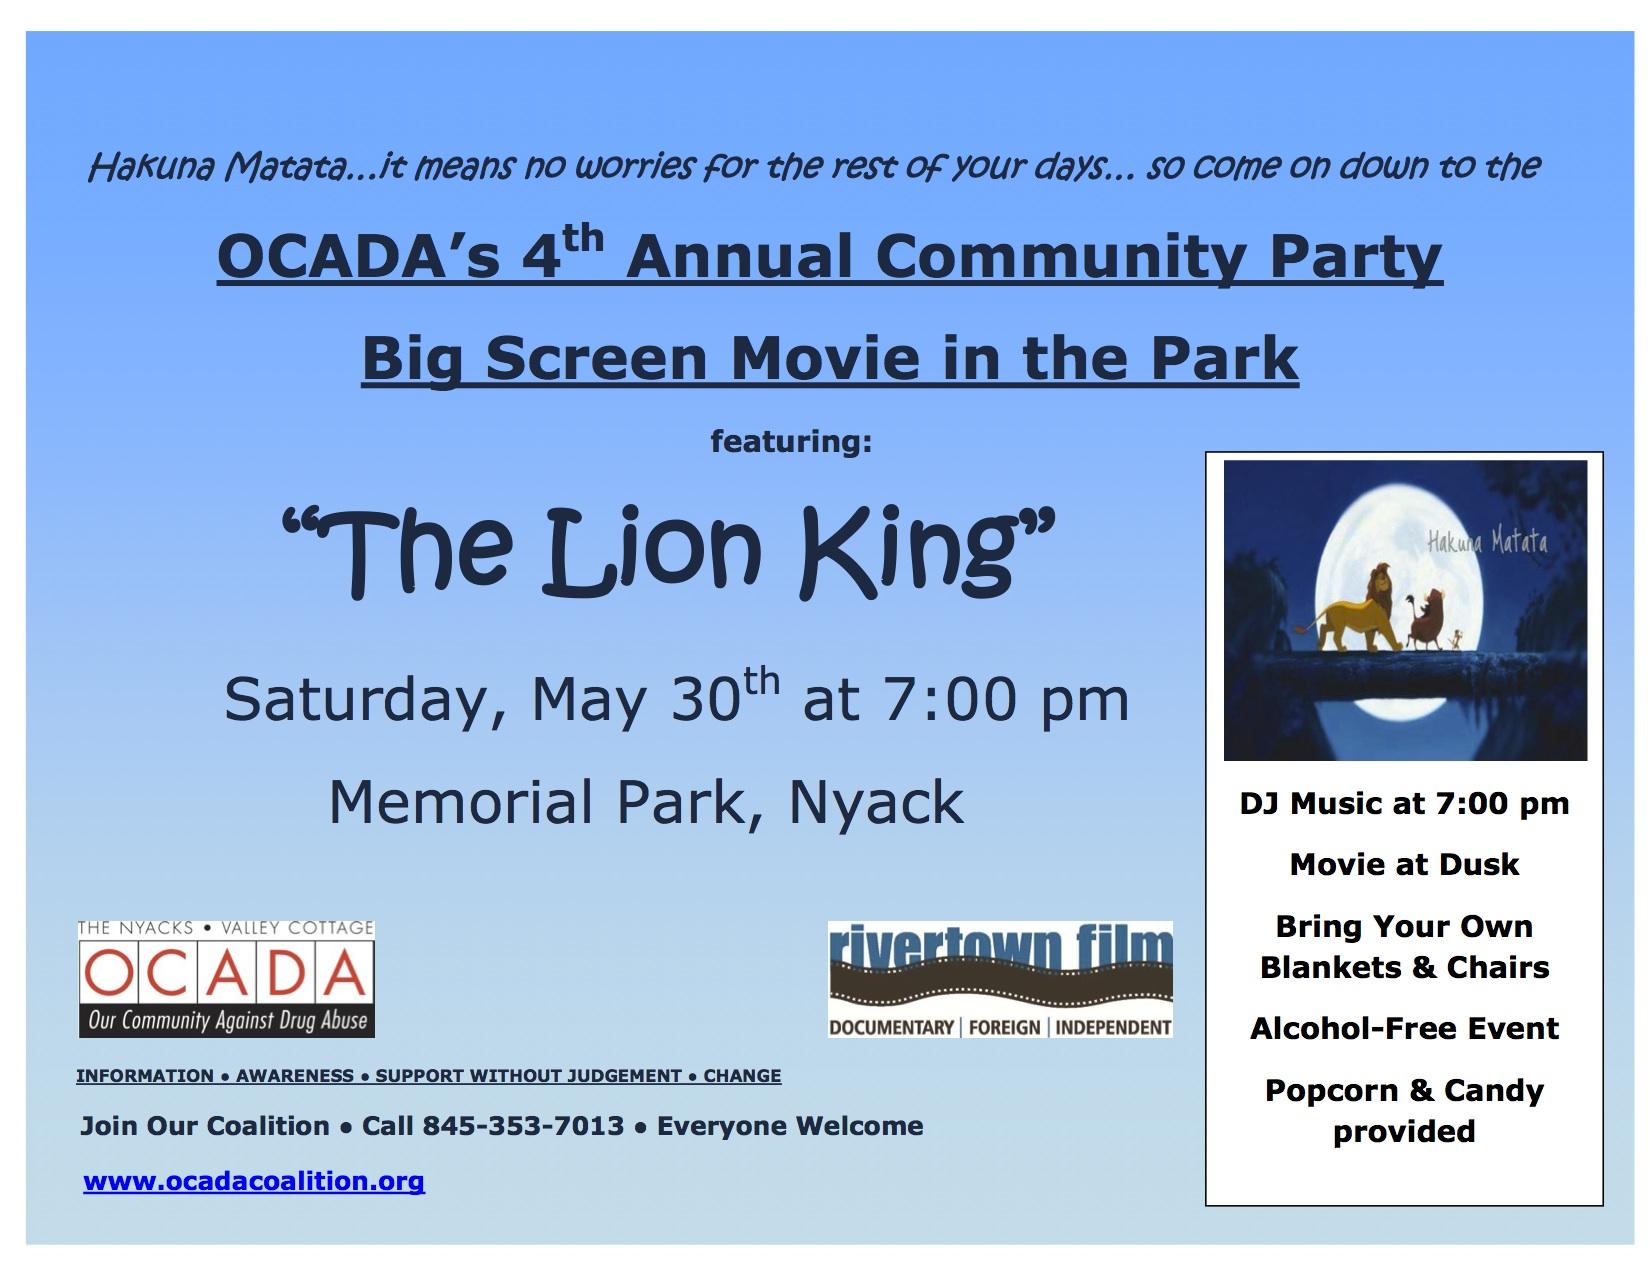 OCADA Community Party Flyer 2015